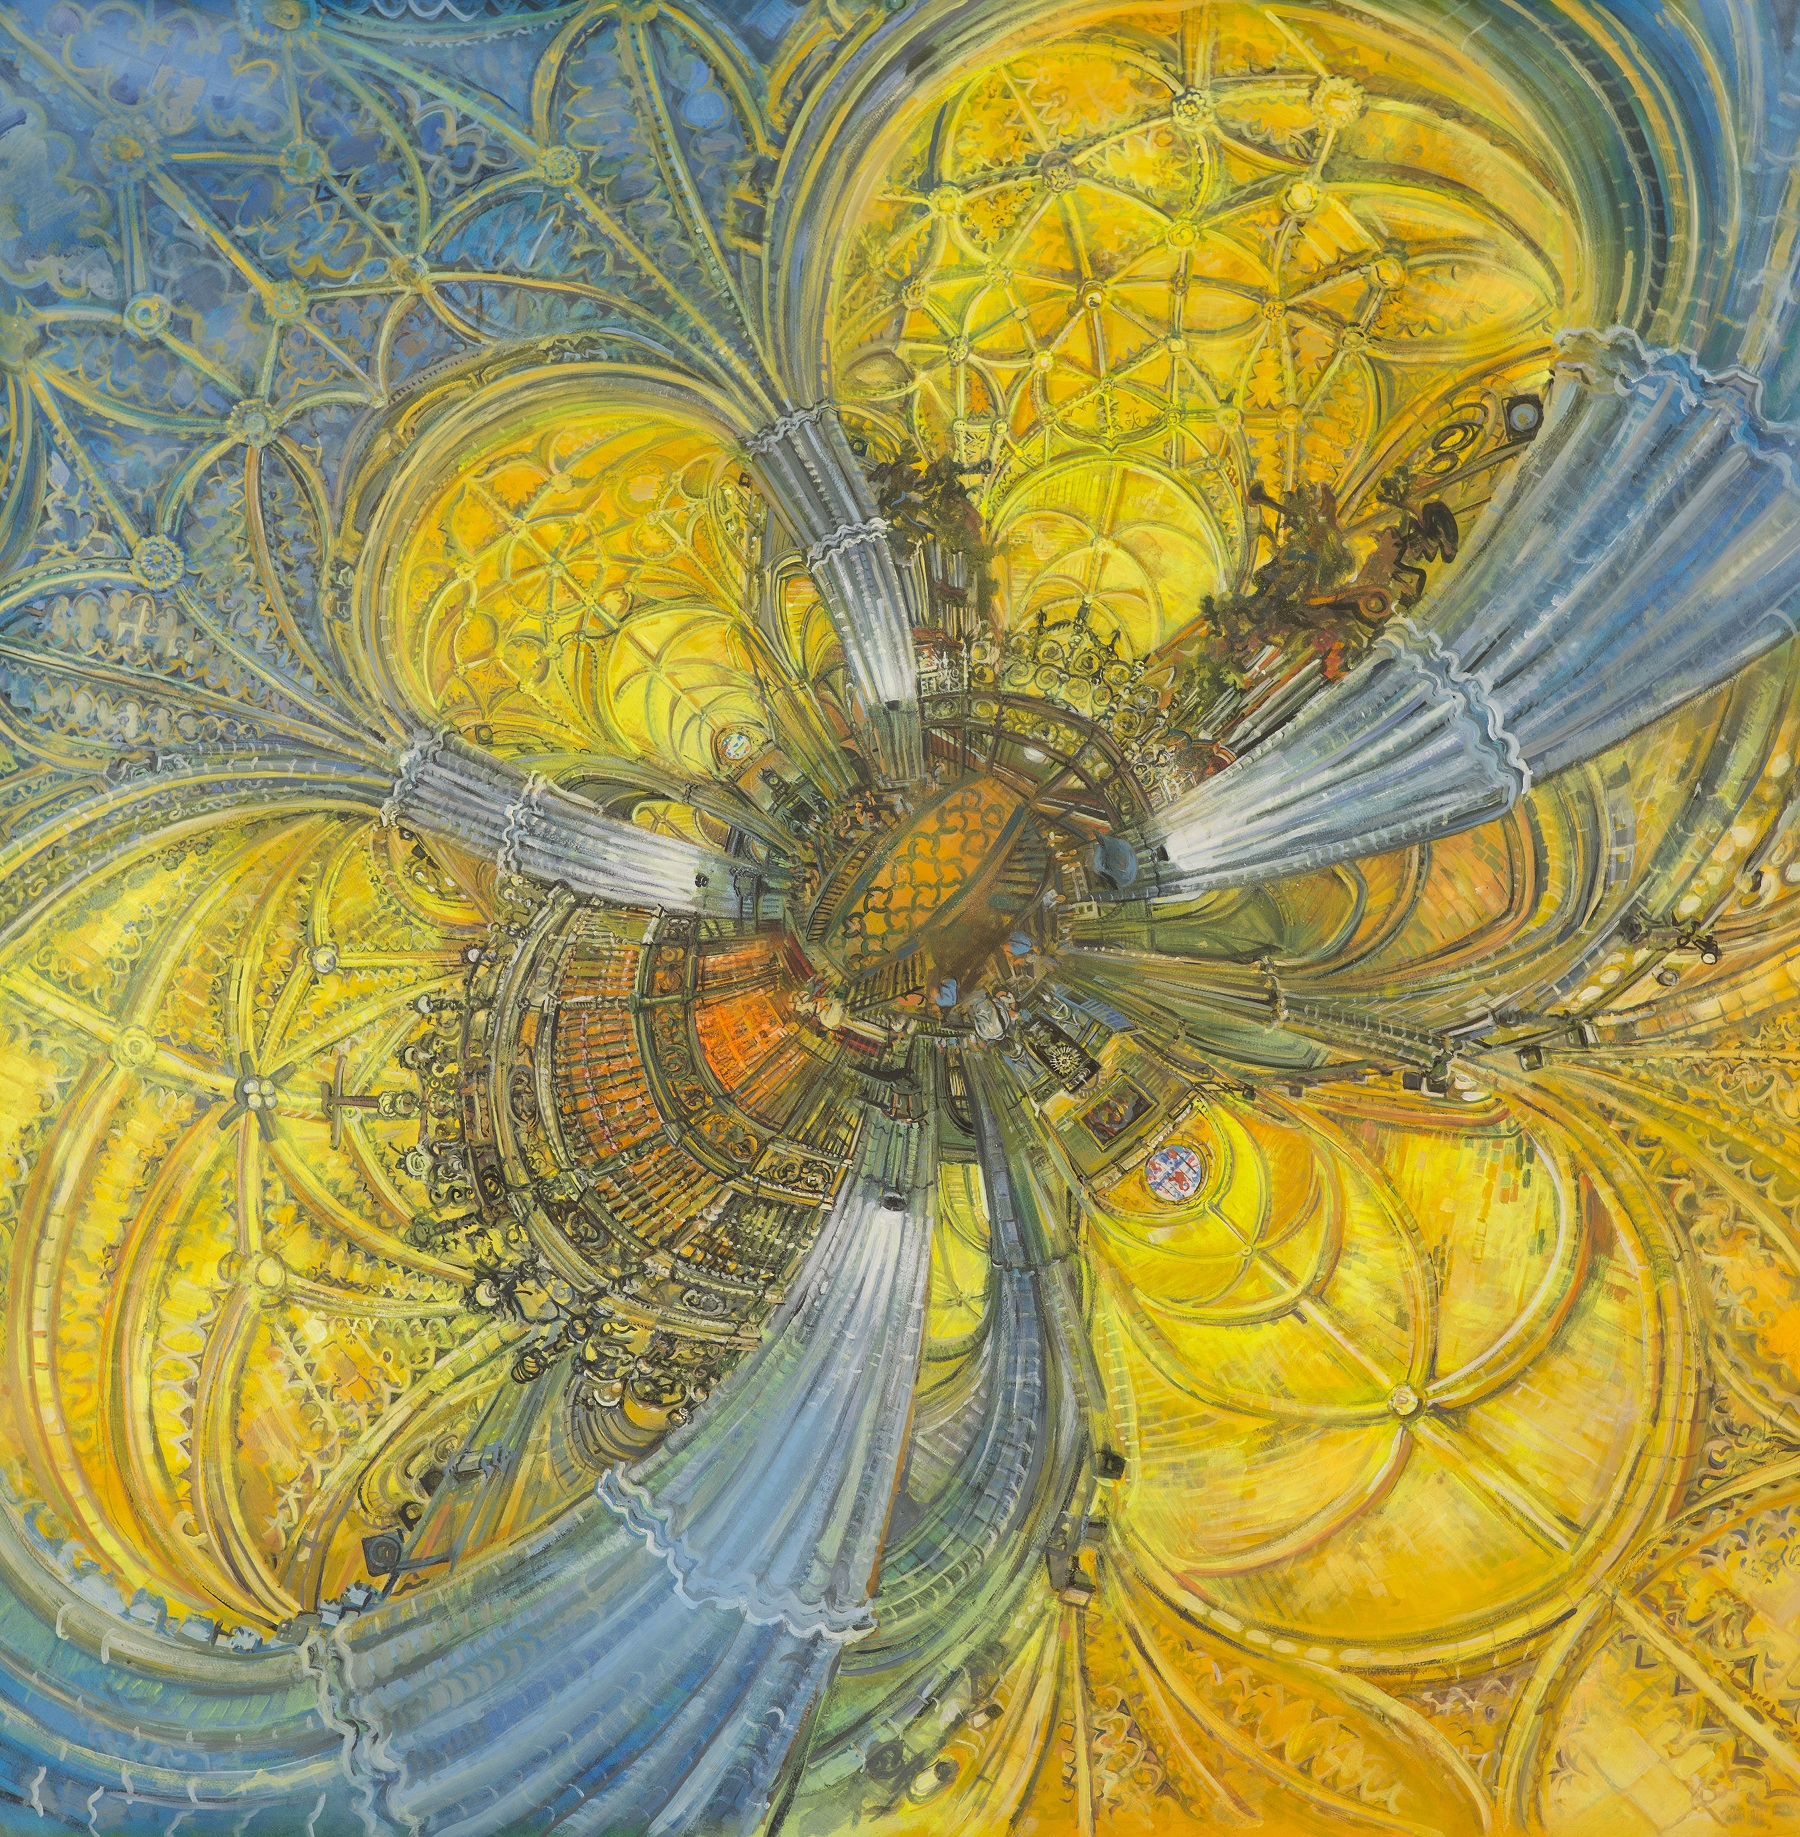 The Flower, Acrylic on paper, 144cm x 145.4cm, 2015